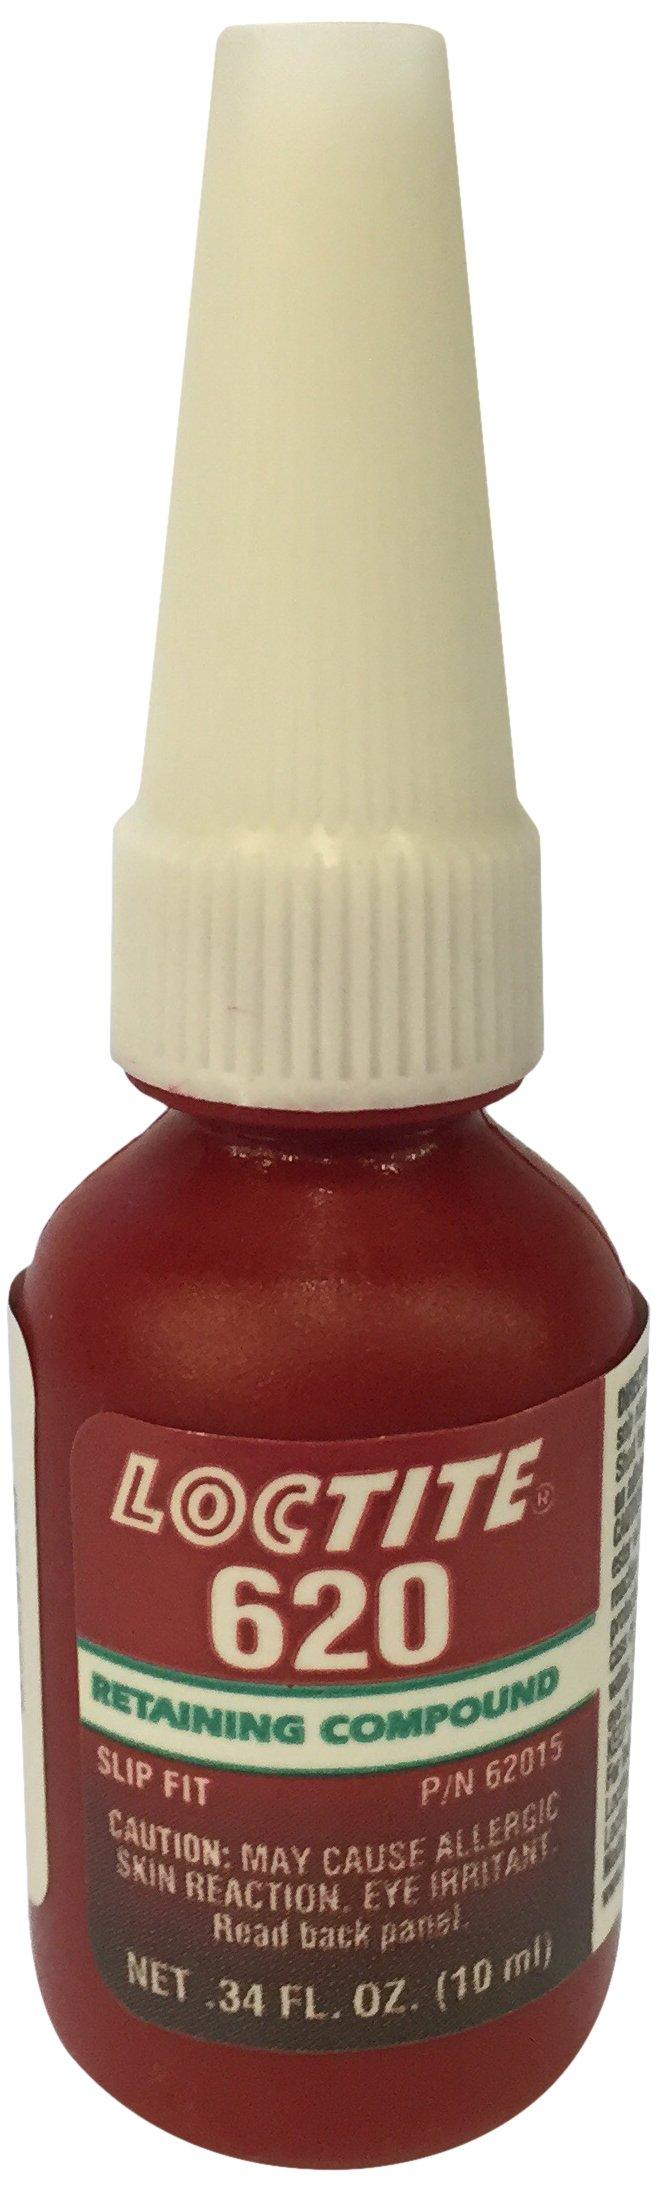 Loctite 234772 Green 620 High Temperature Retaining Compound, 10 mL Bottle